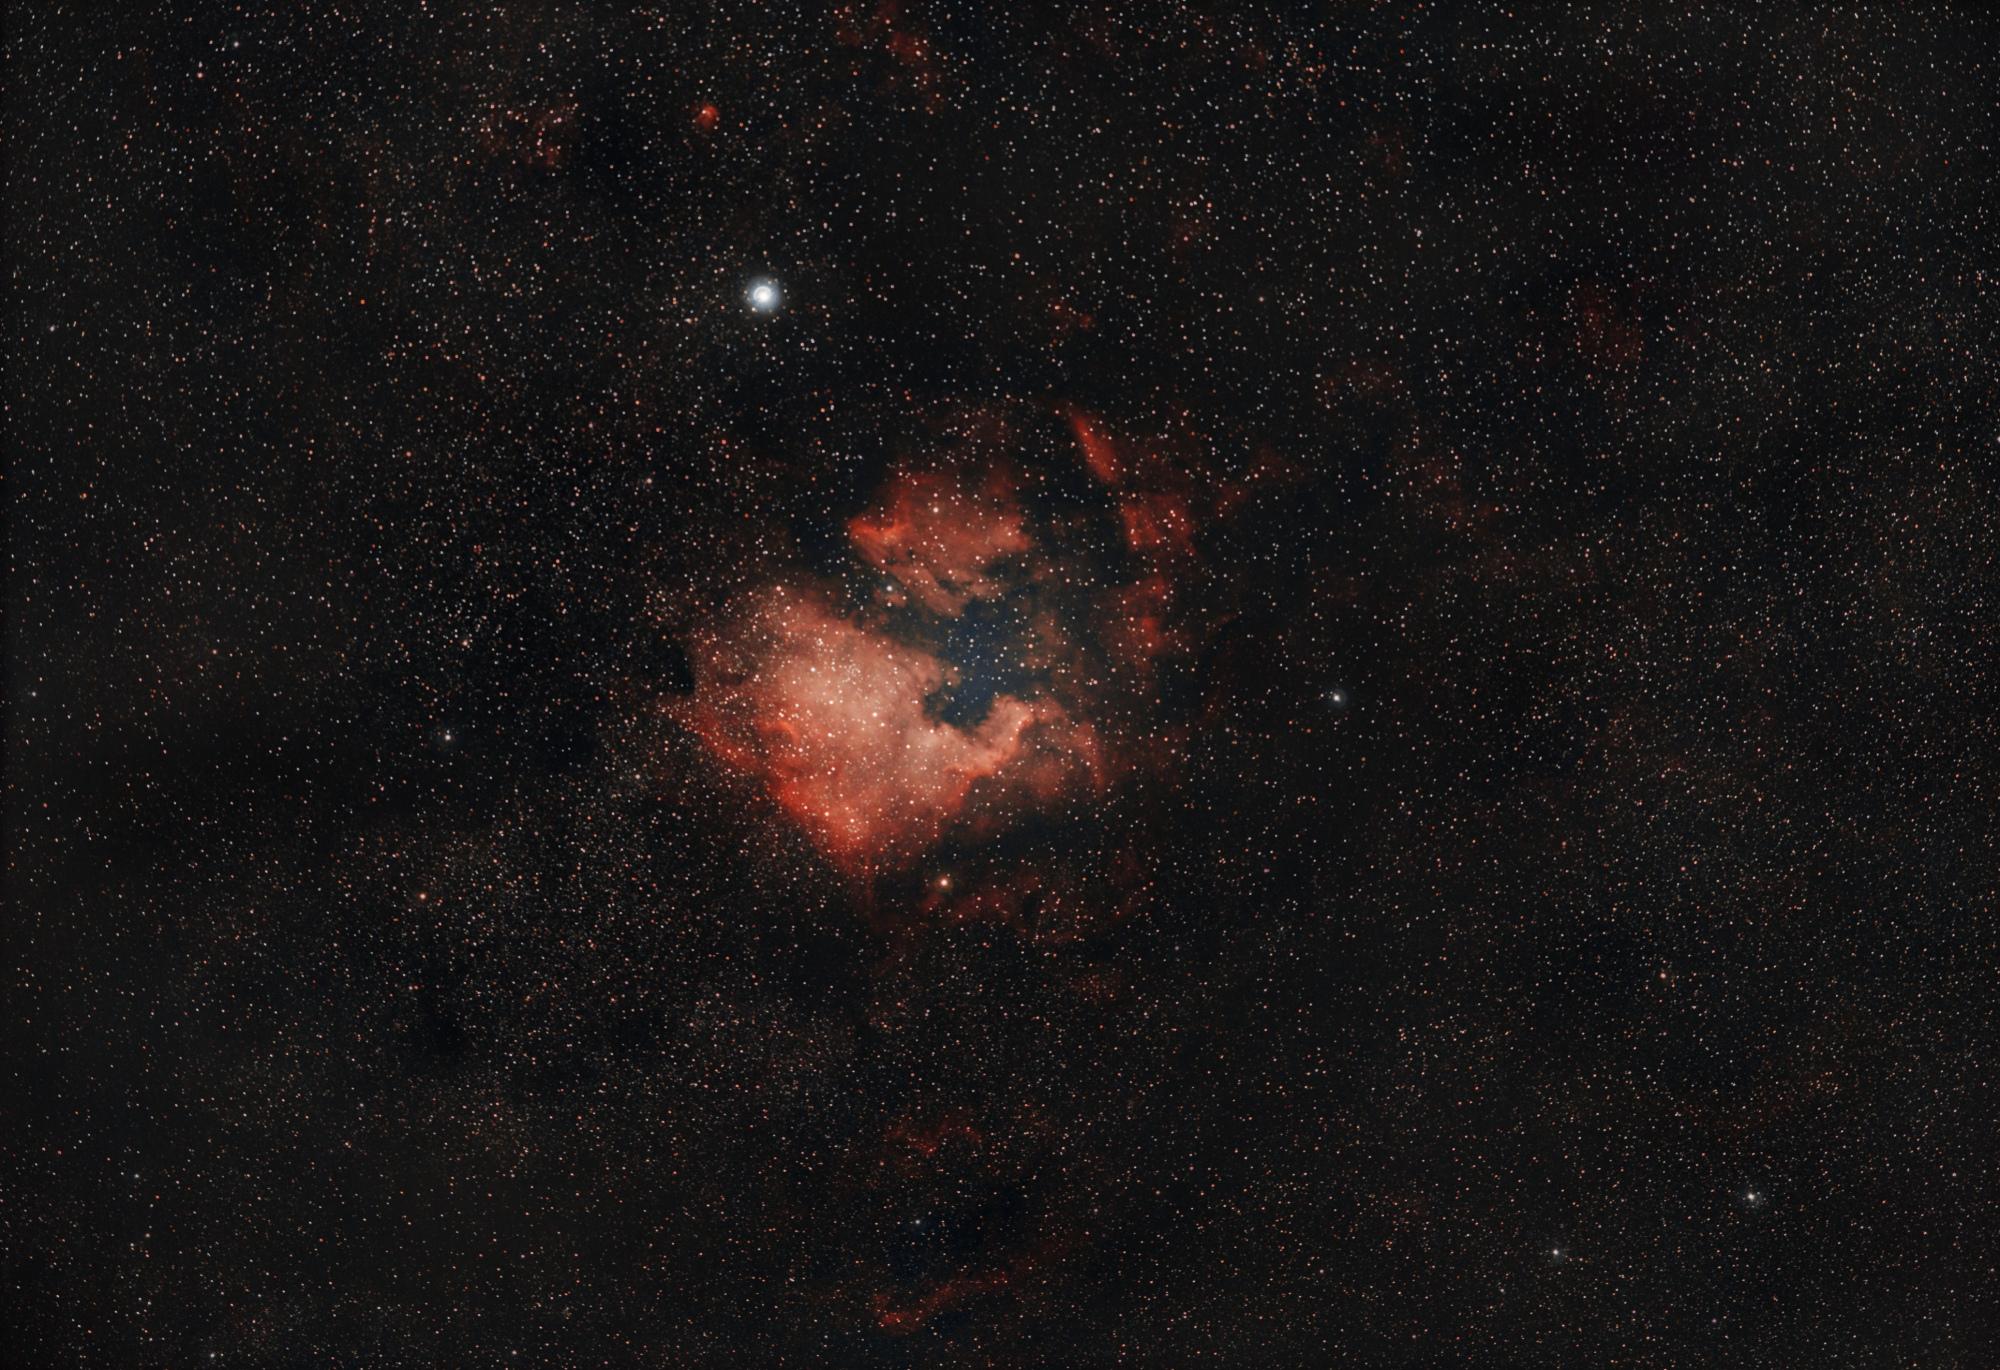 NGC7000_135_DuoNB.thumb.jpg.e32f45e14e072f211abb3605a17beaf9.jpg